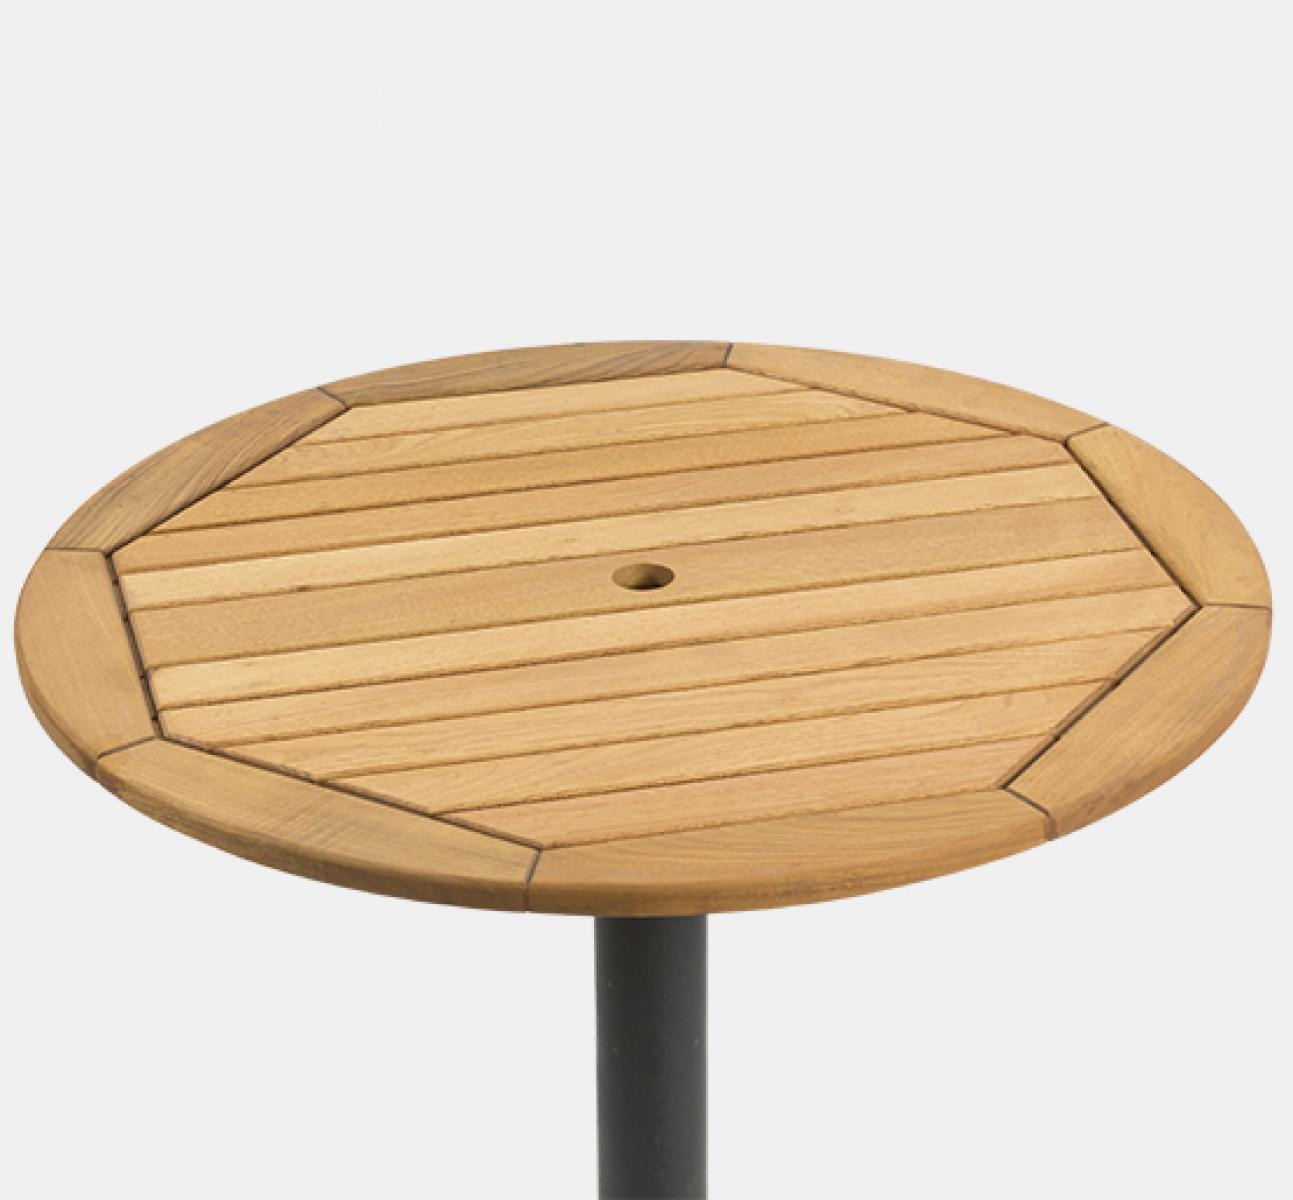 Teak Round Table Top (700mm dia)